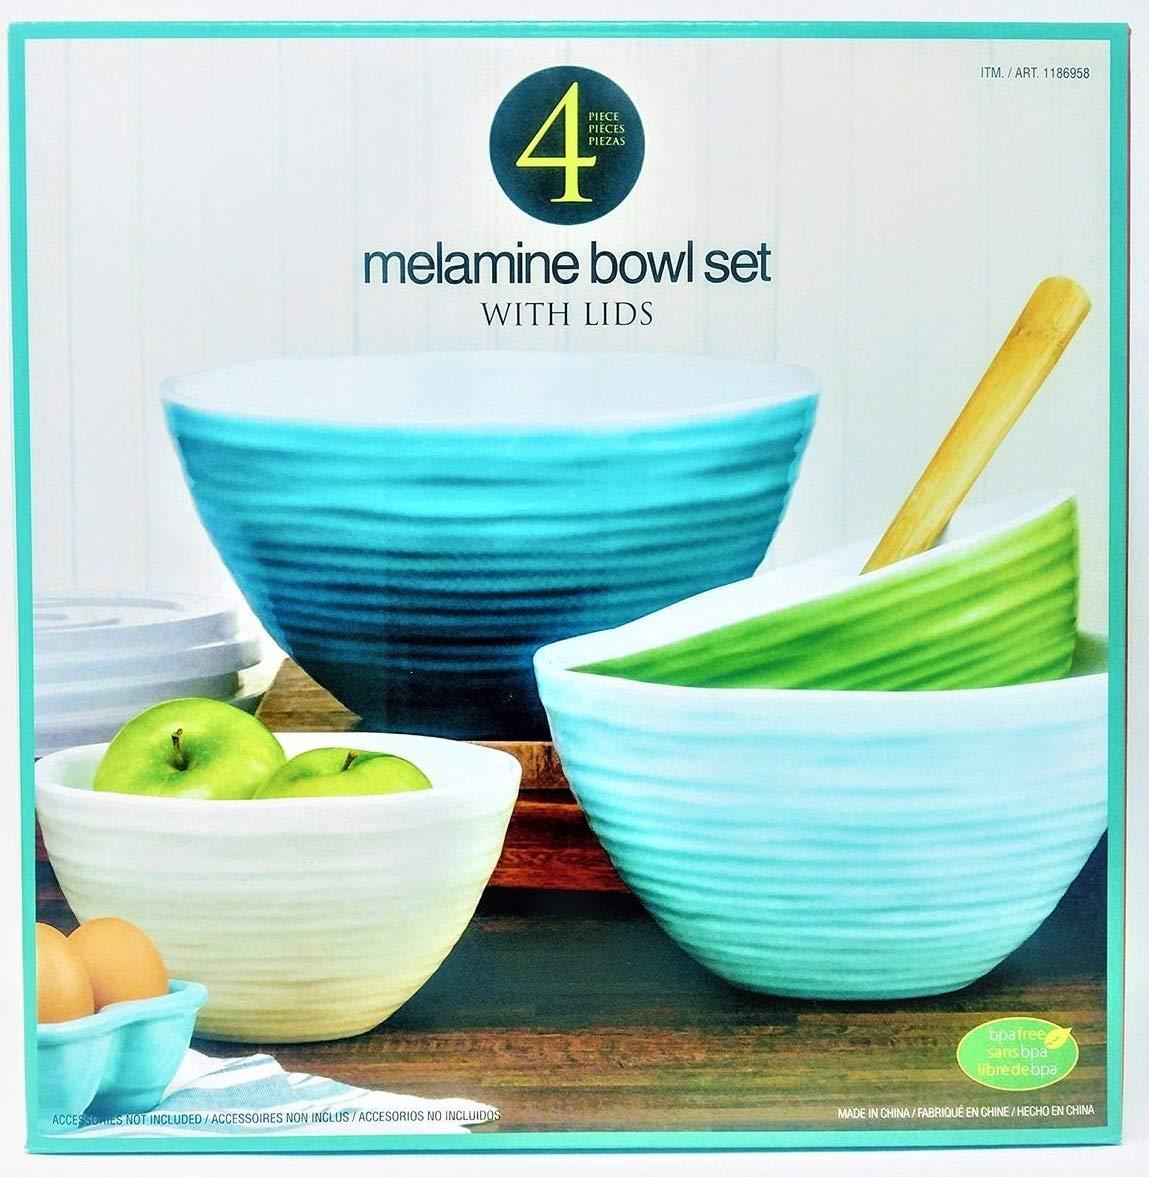 Melamine Mixing Bowl Set with Lids, 4 Pieces